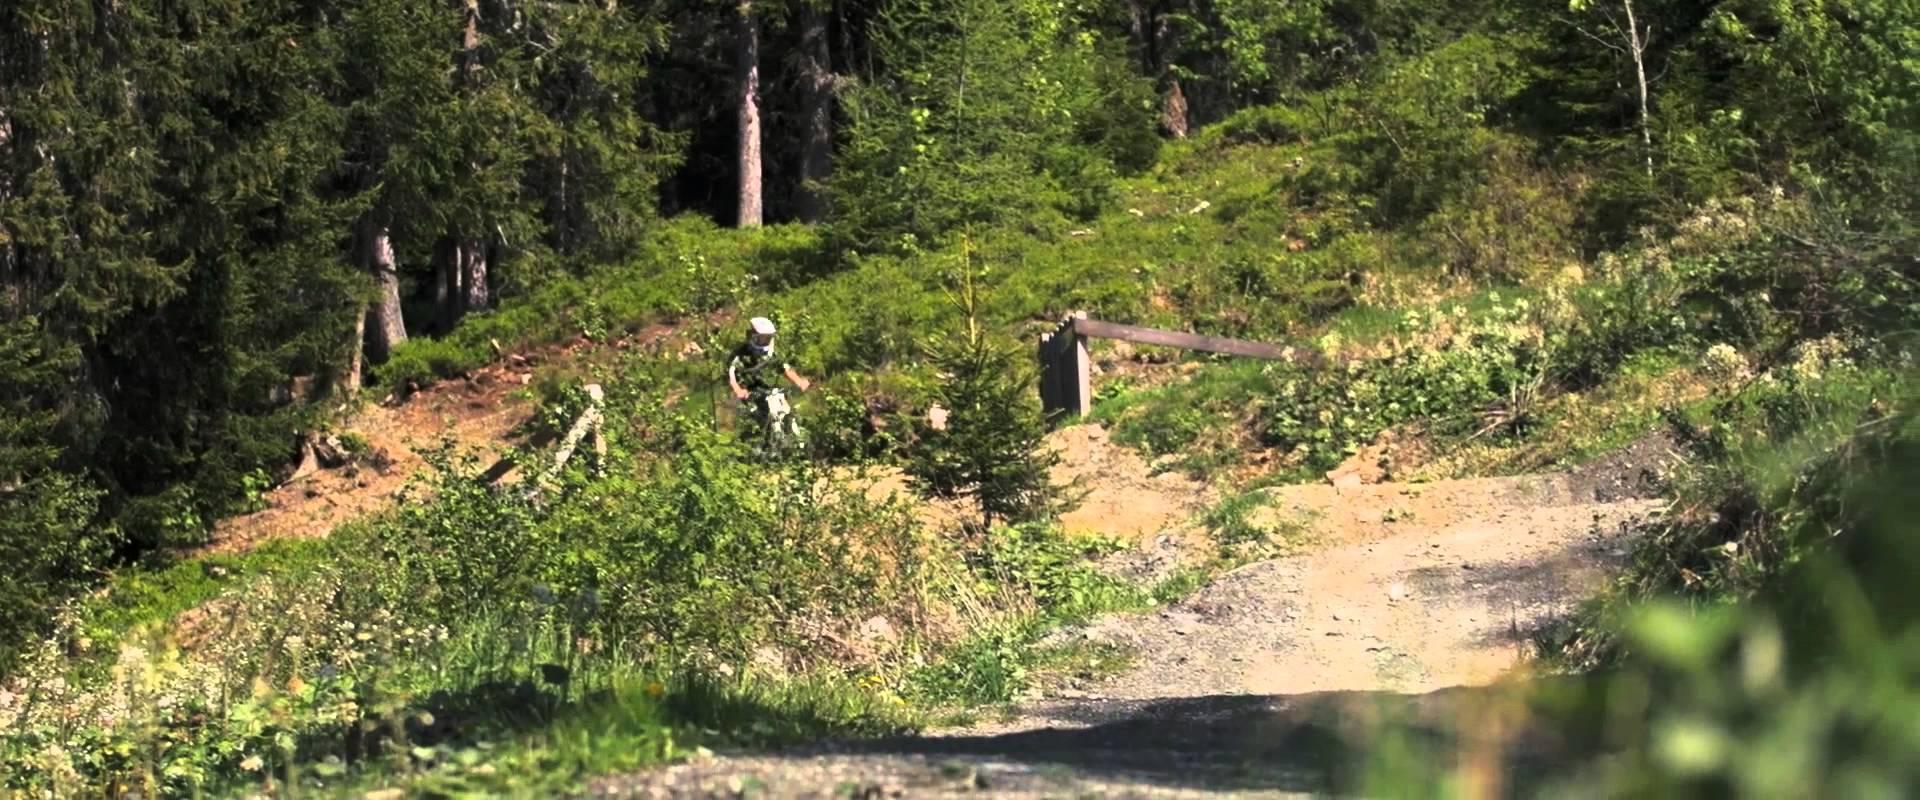 Bikepark Planai – Season Teaser 2014